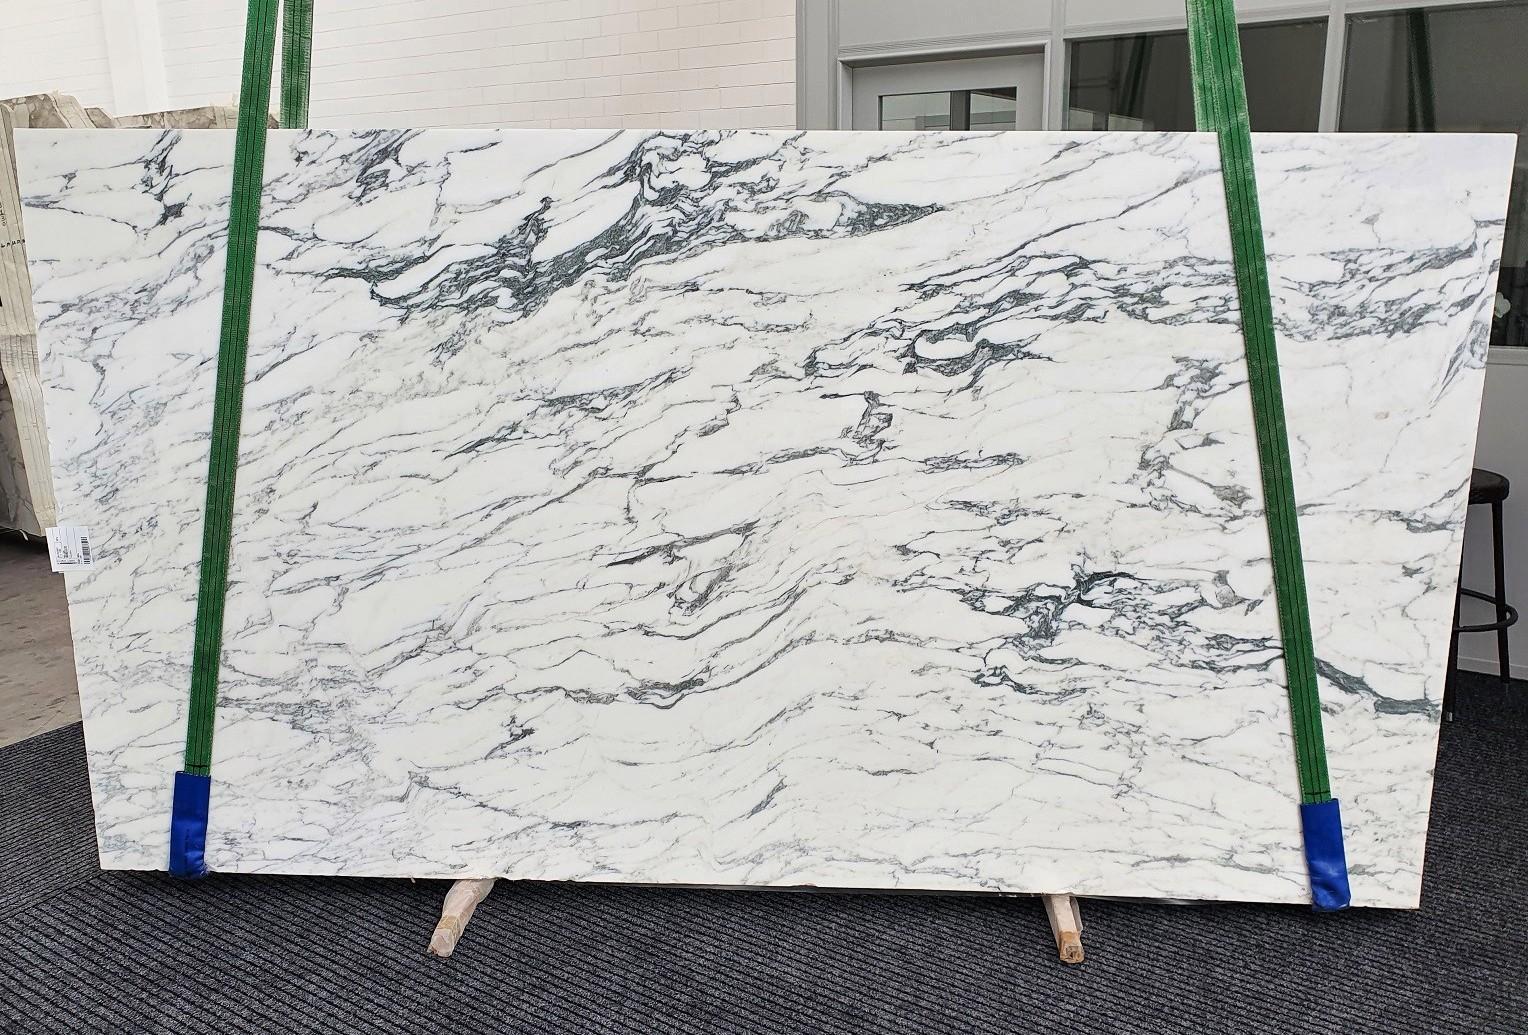 ARABESCATO FAINELLO Supply Veneto (Italy) polished slabs 1356 , Slab #23 natural marble